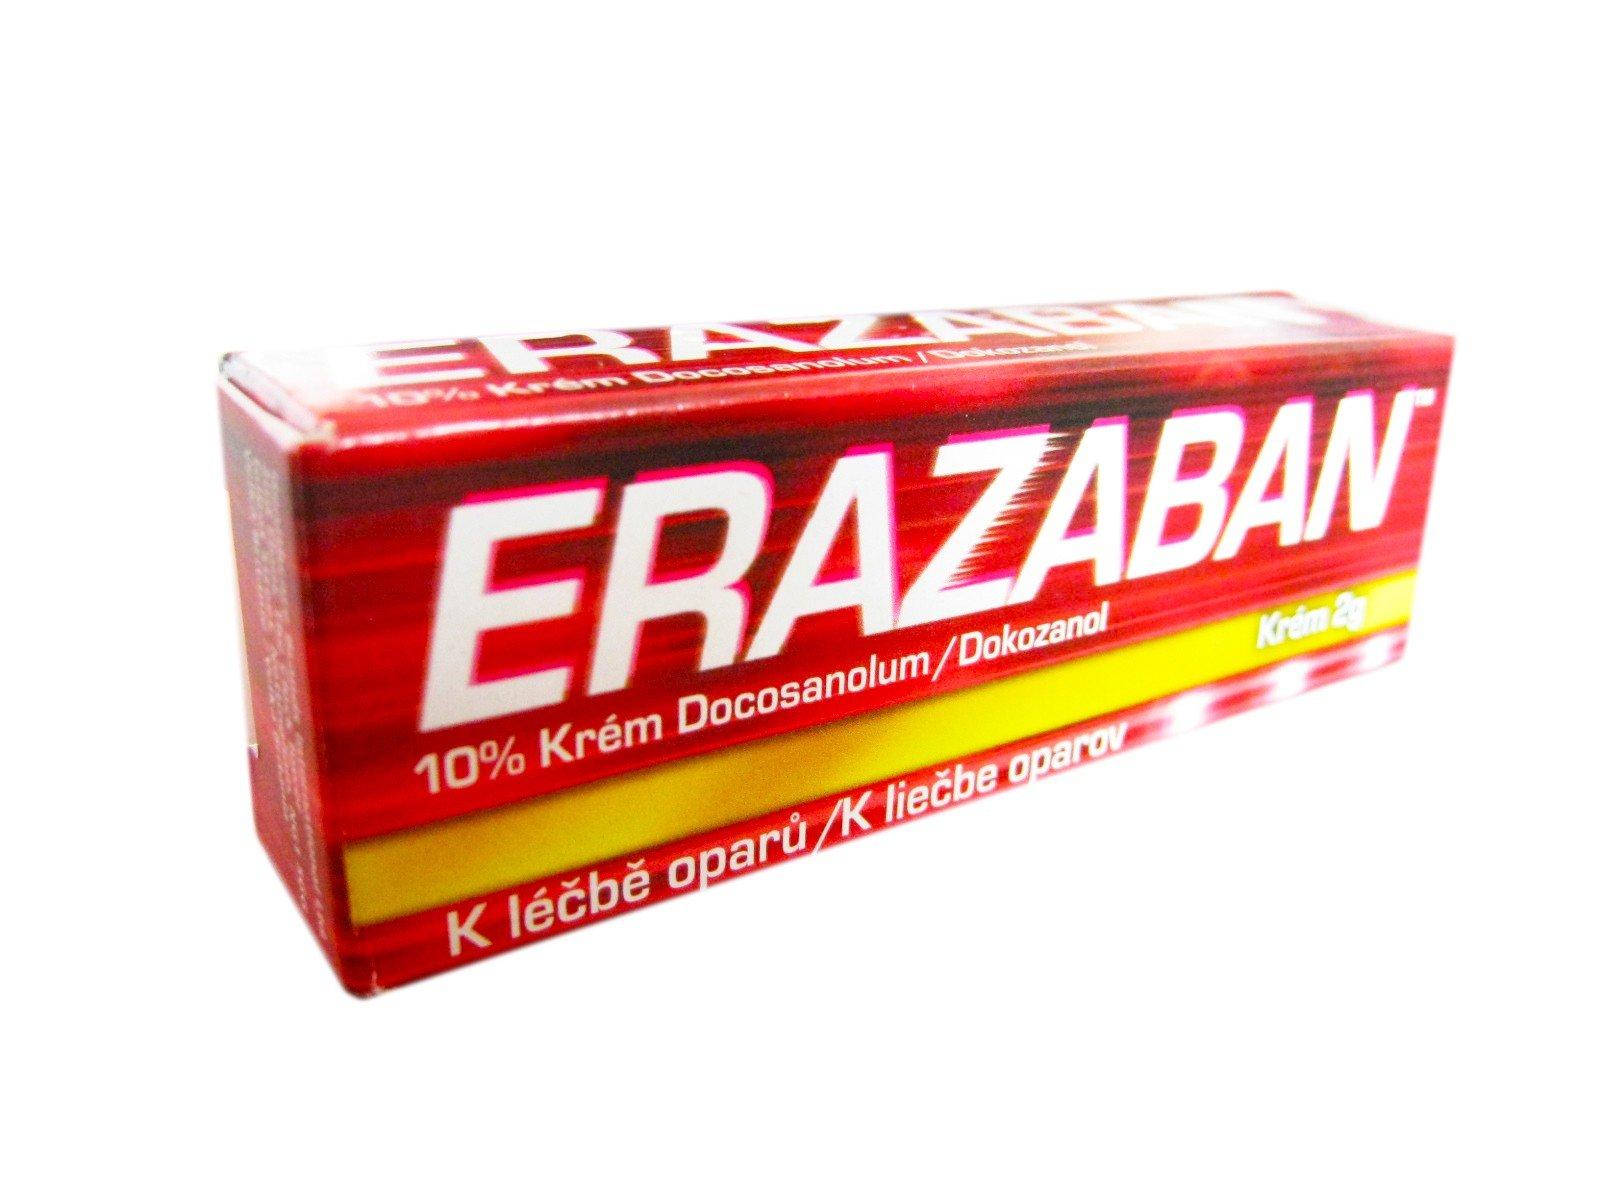 ERAZABAN krém 2g 10%